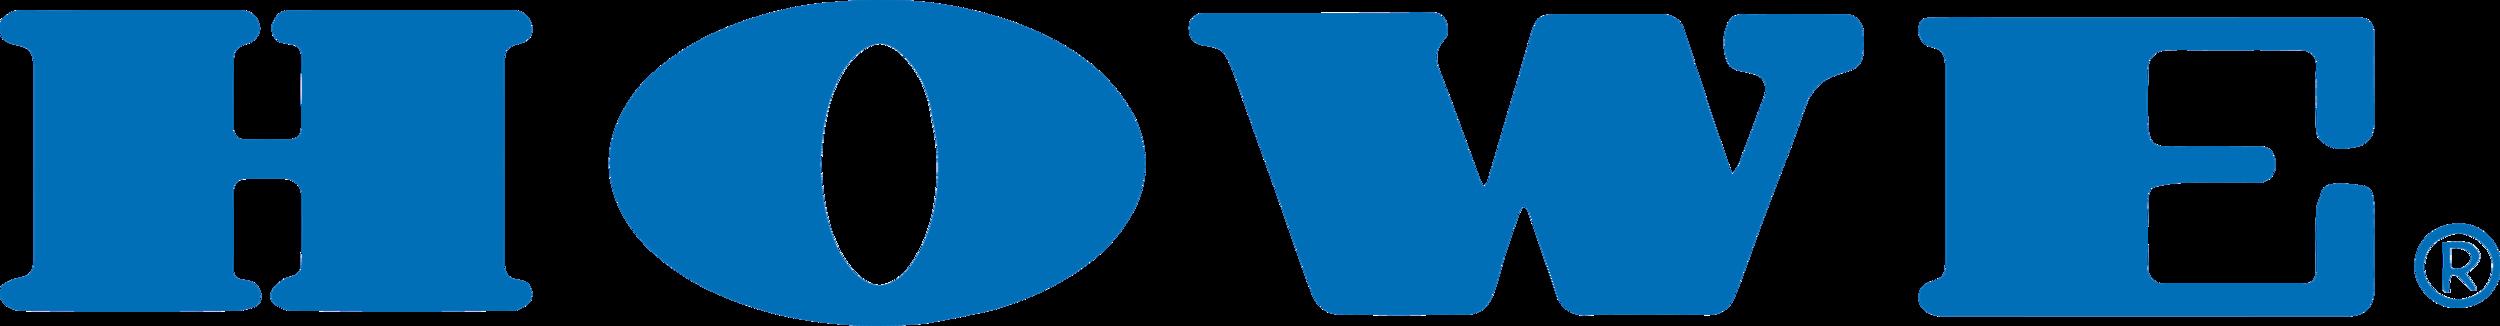 Howe Corporation.jpg